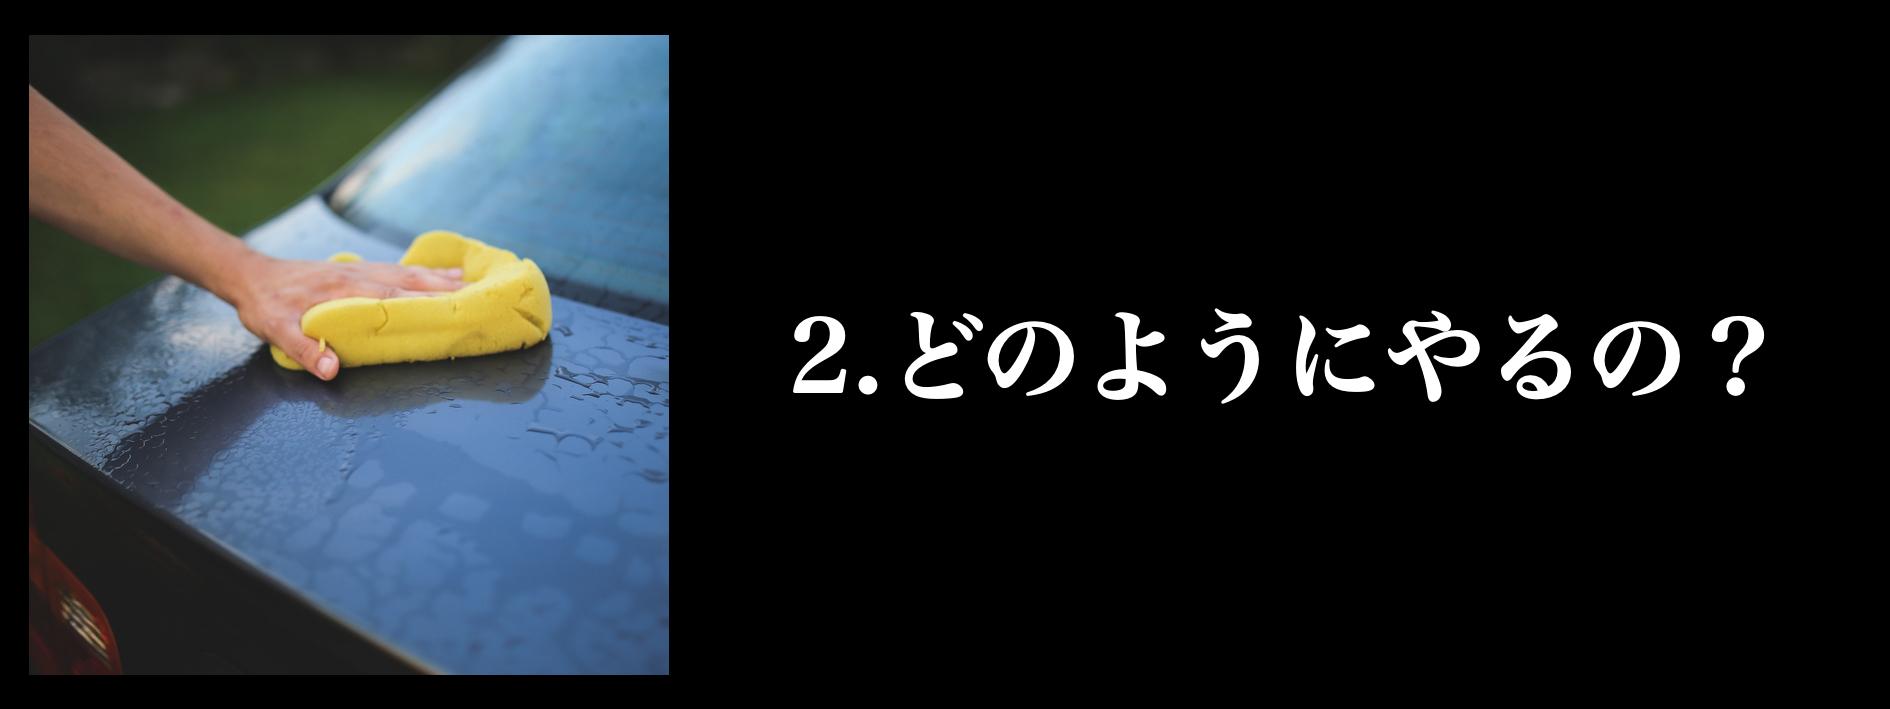 JAPANGOLDWASHの洗車はどのようにやるの?